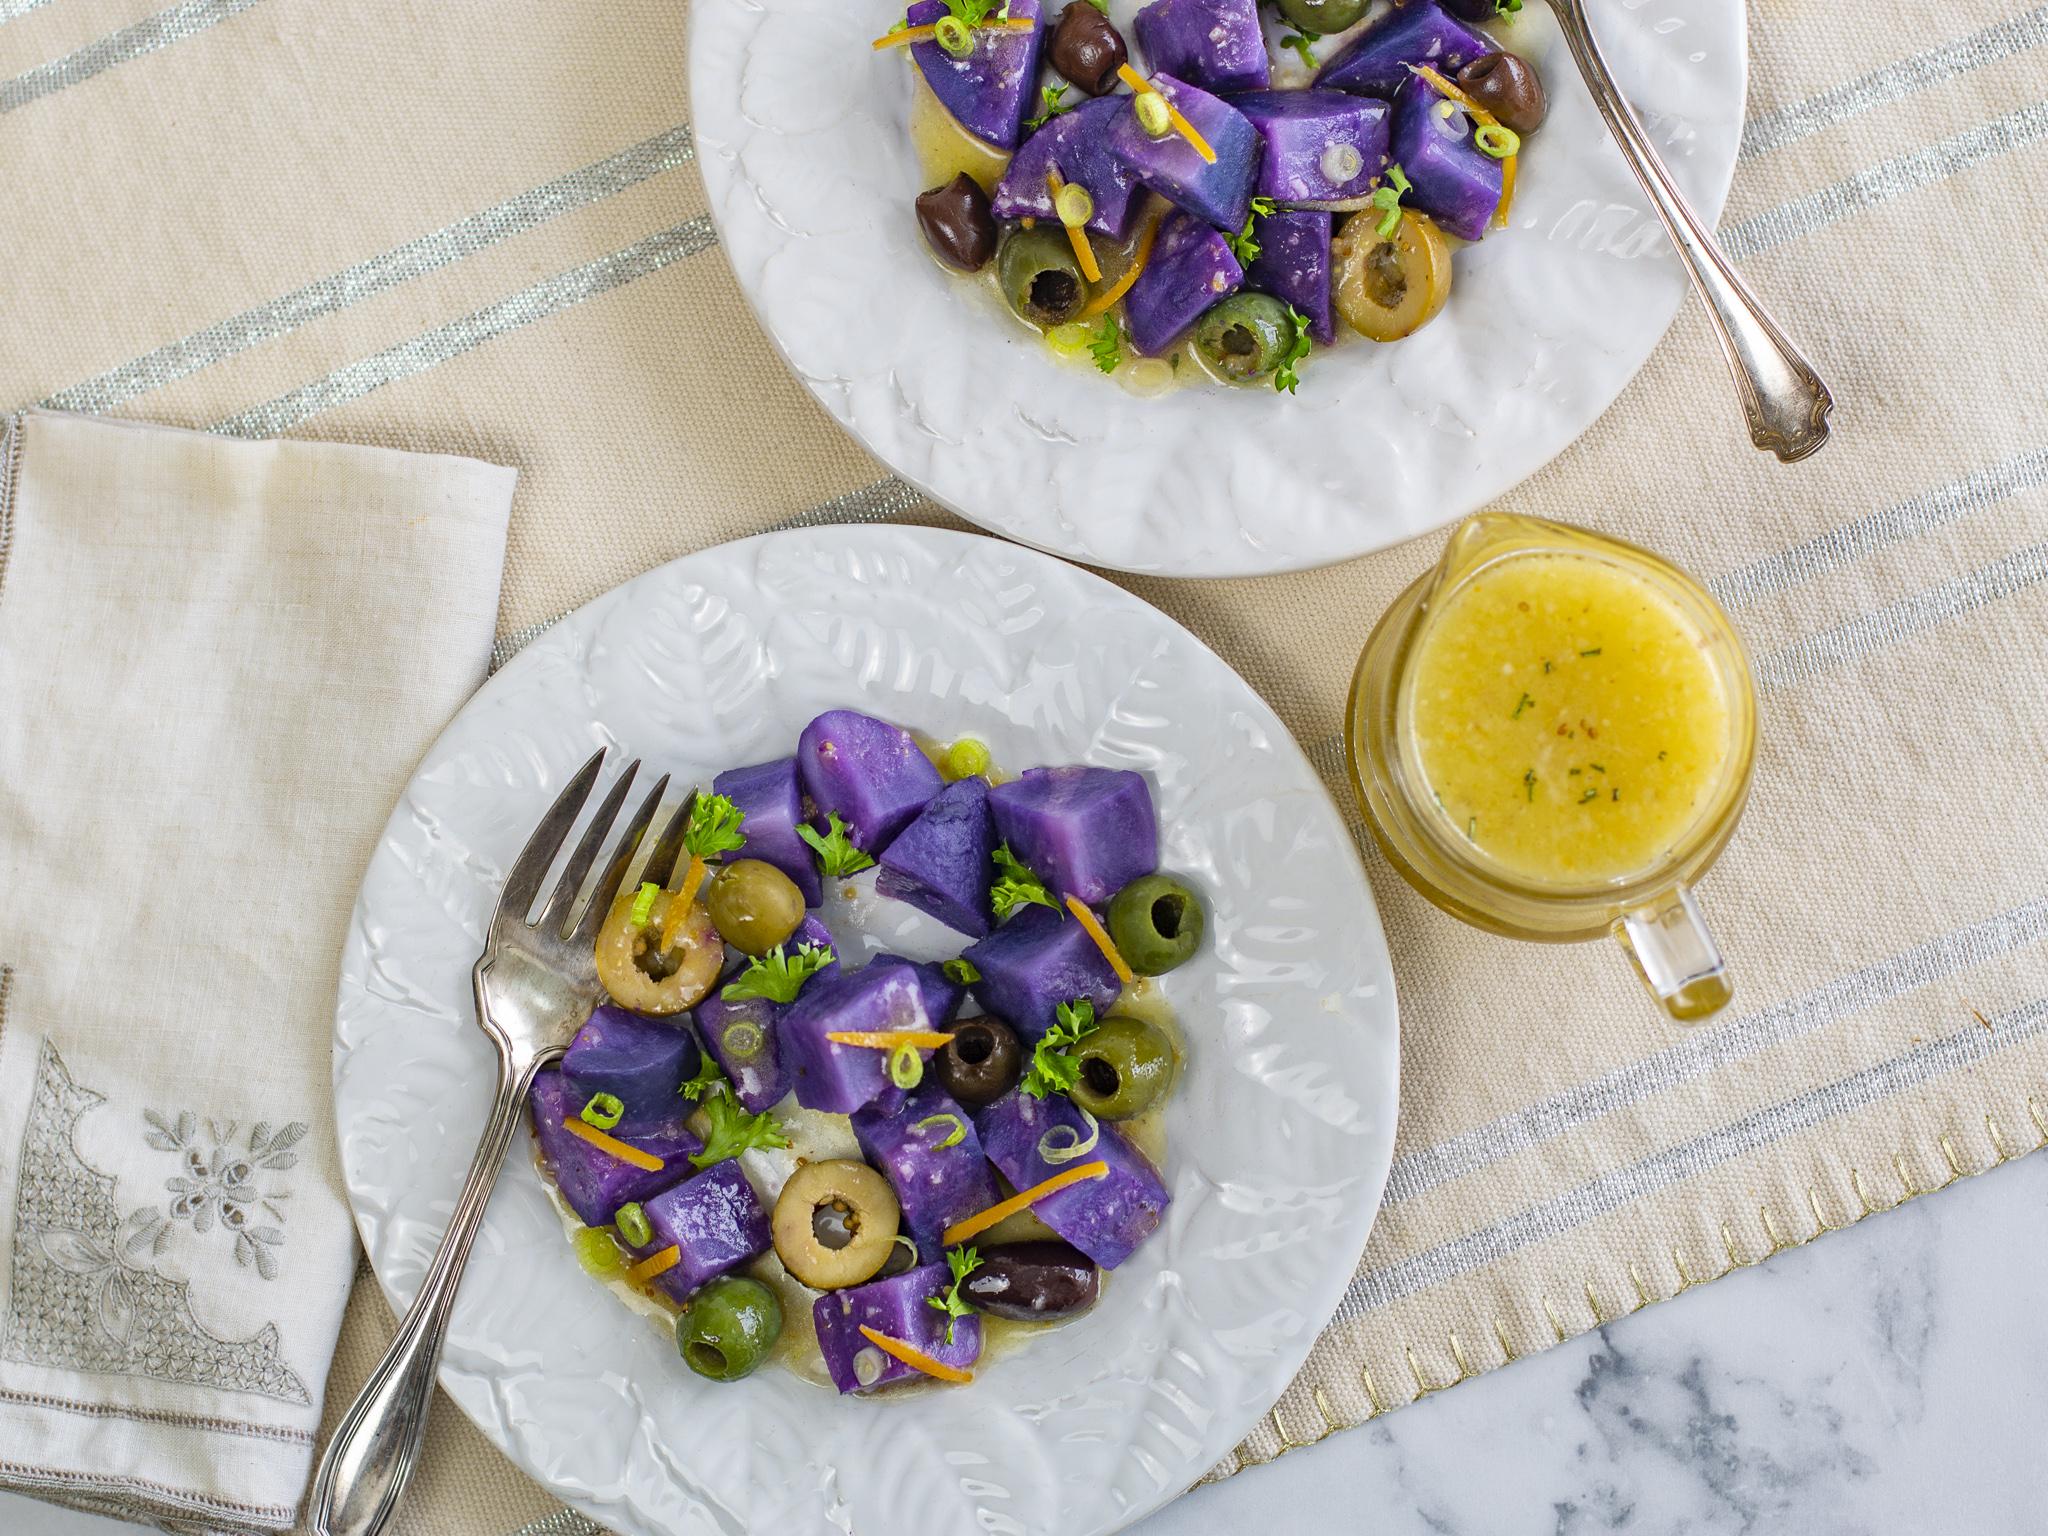 Purple Peruvian Potato salad with preserved lemon vinaigrette on vintage plates